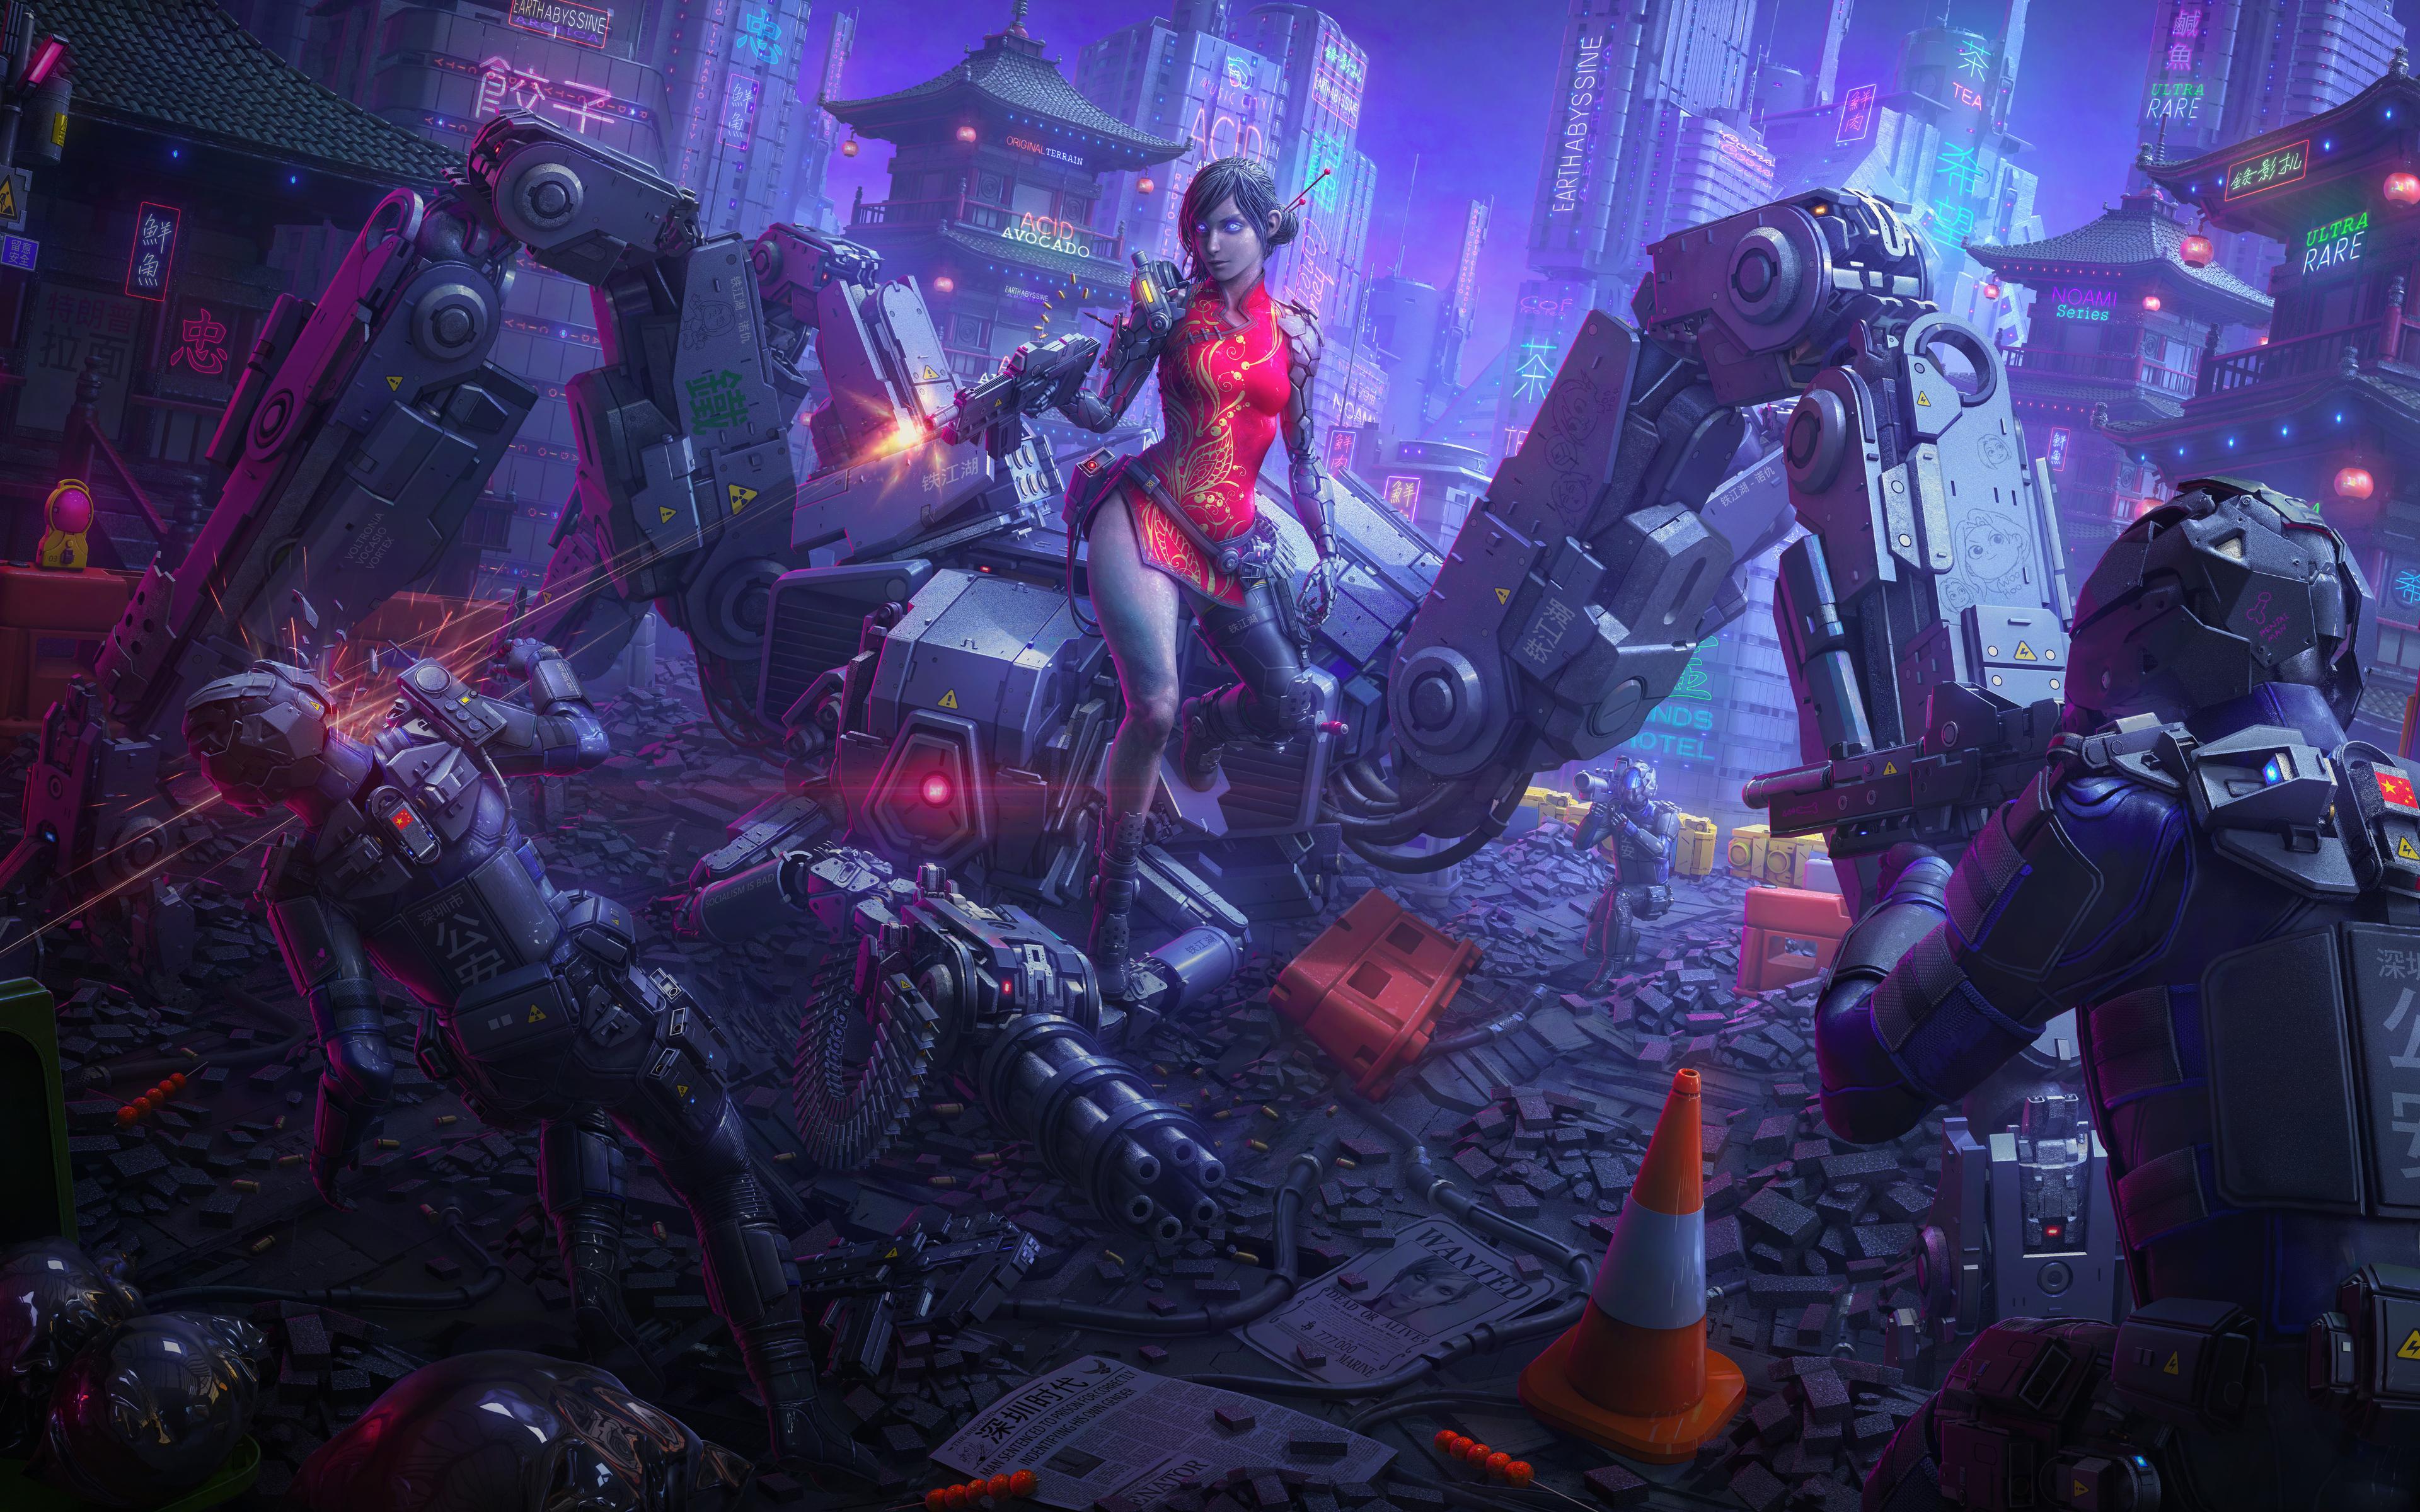 cyborg-girl-killing-attacker-8k-kc.jpg